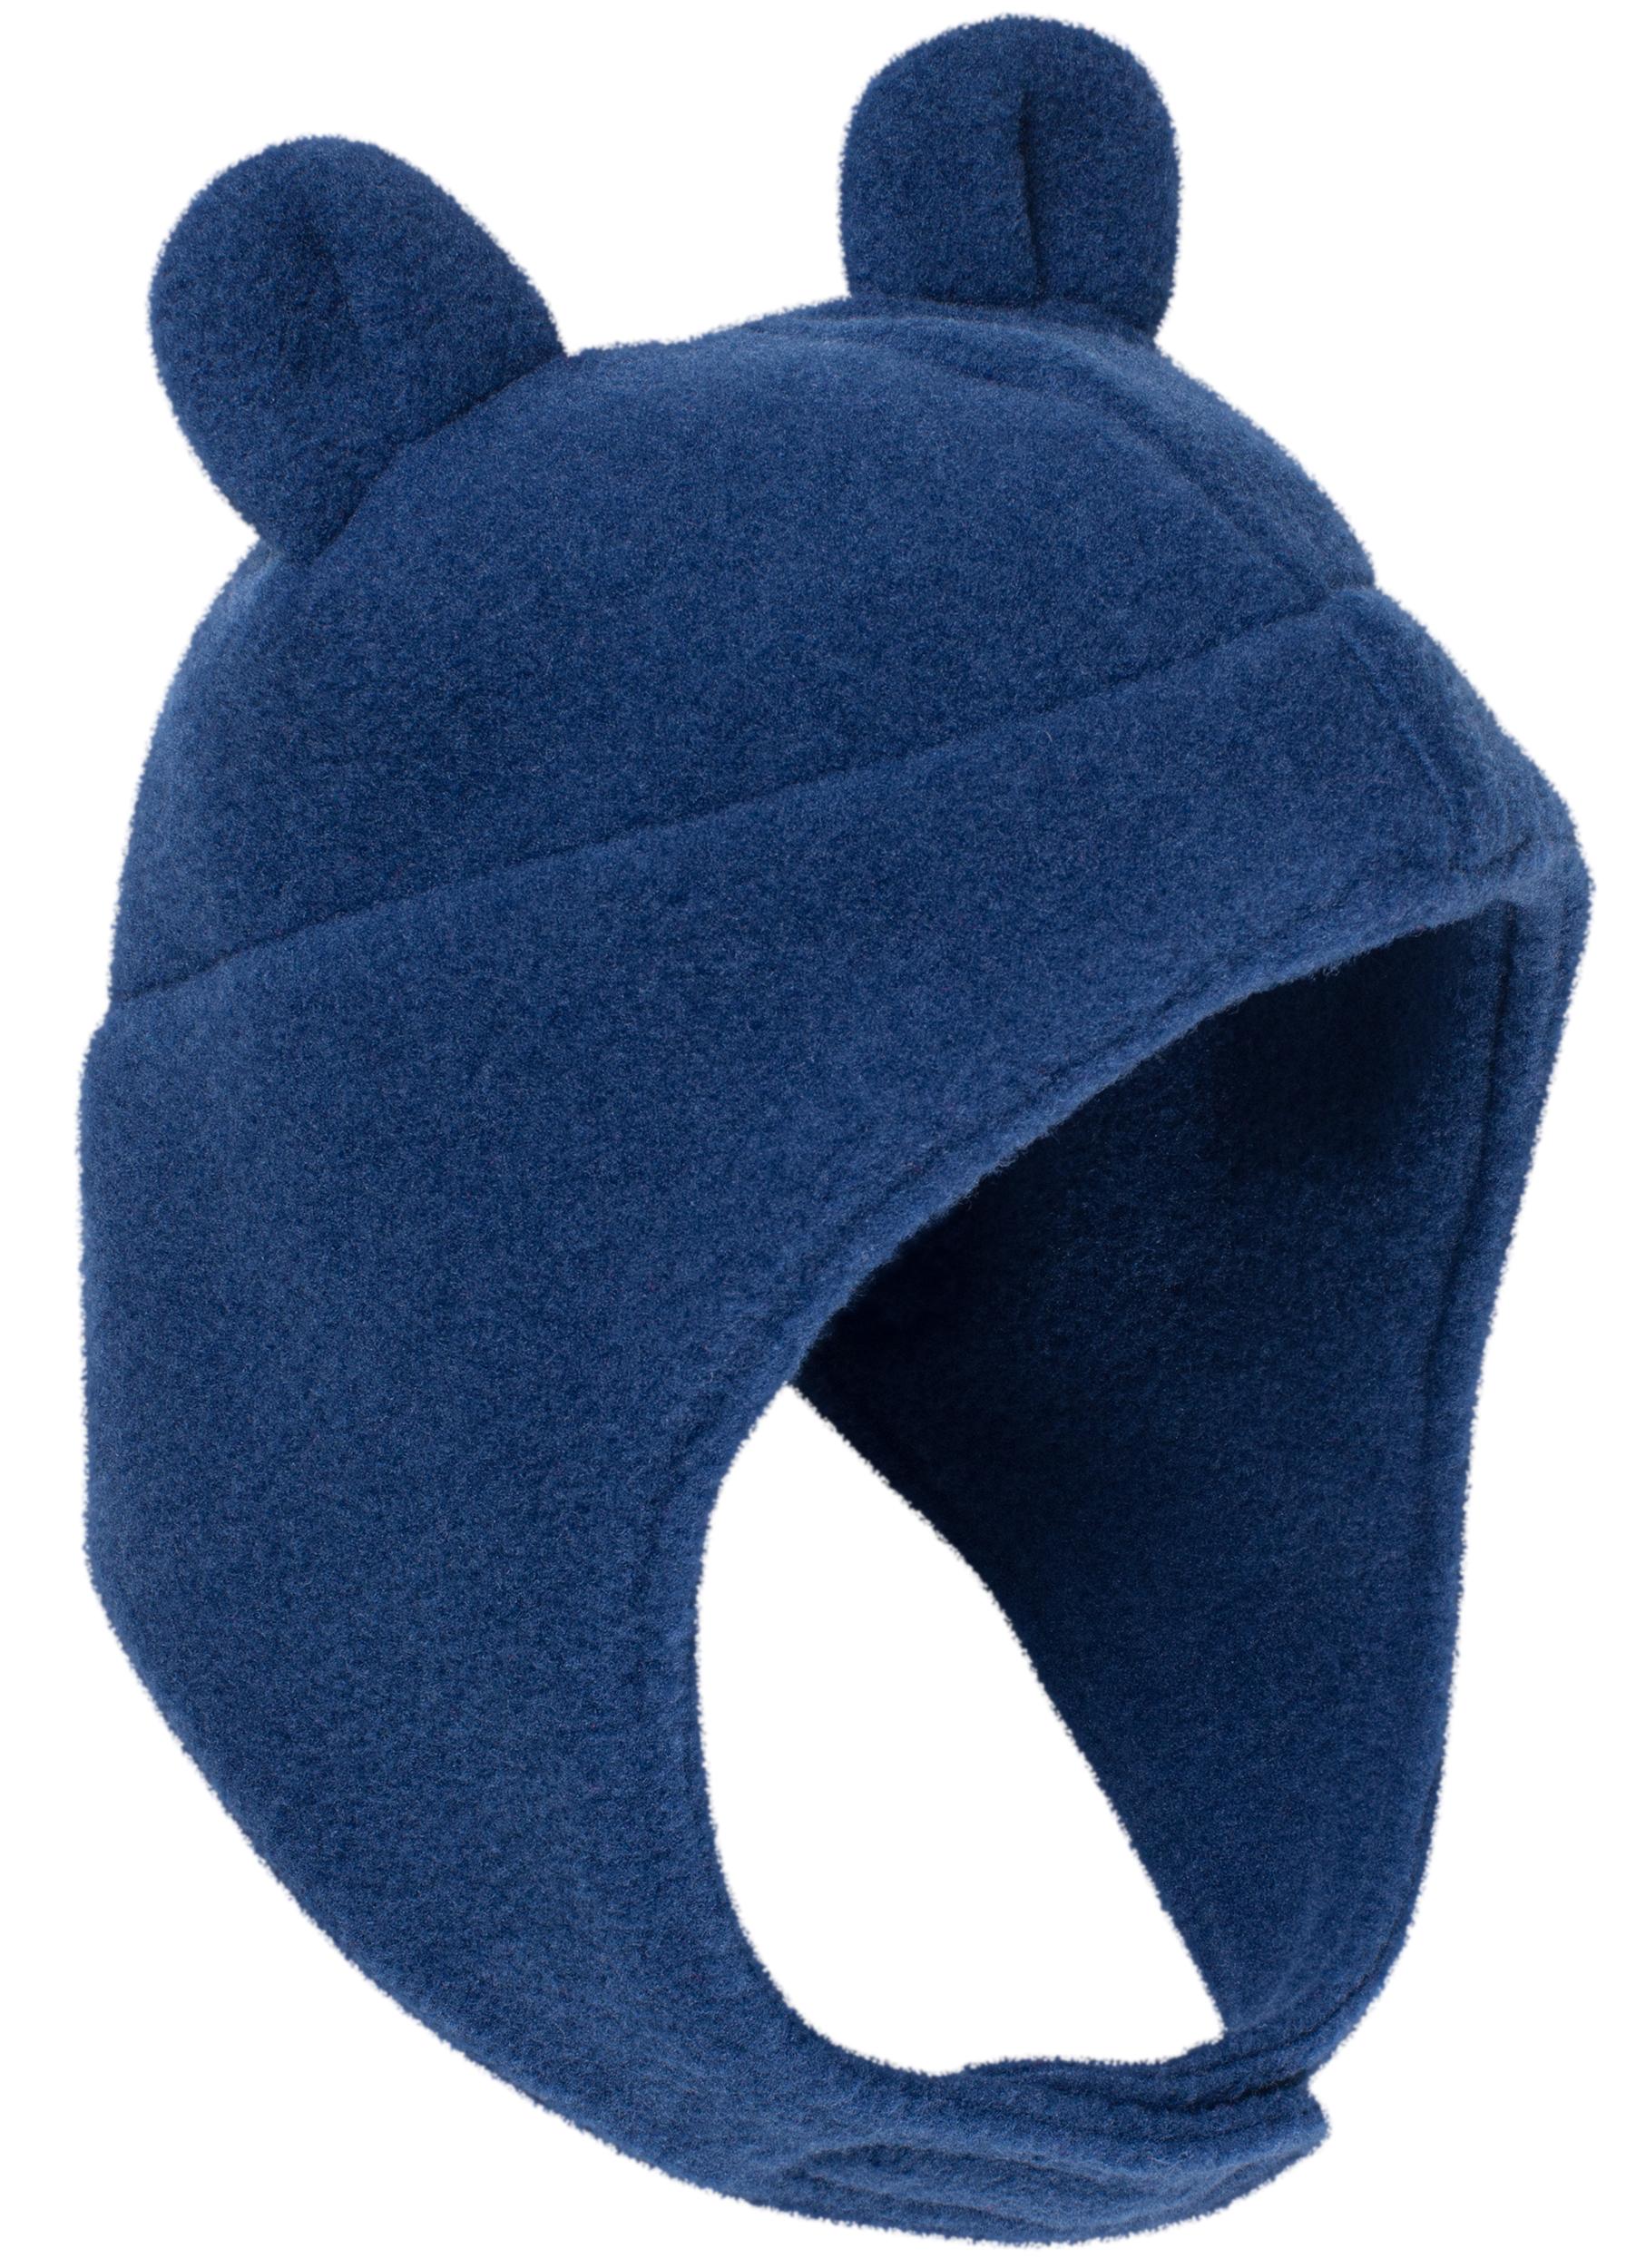 797cda288ca MEC Bear Cub Hat - Infants to Children